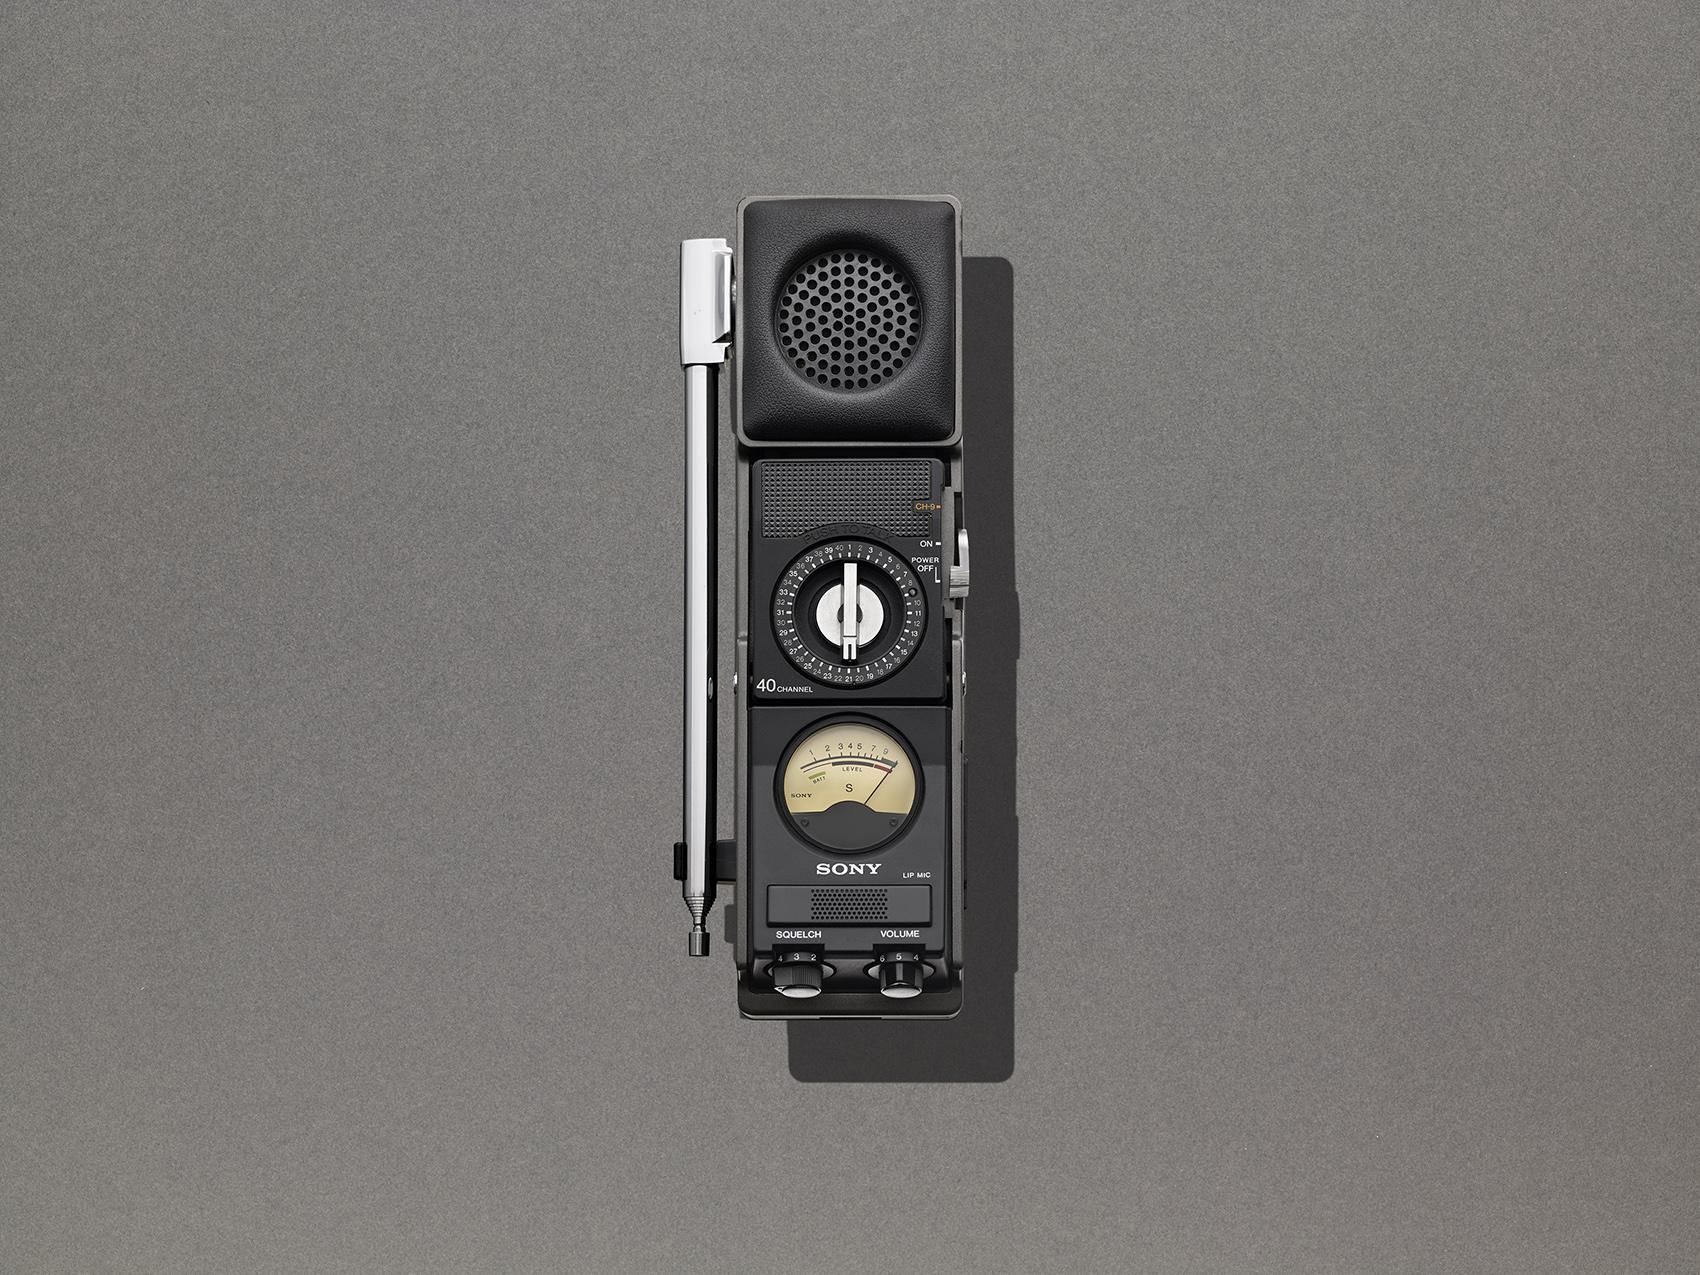 sony-brick-phone.jpg